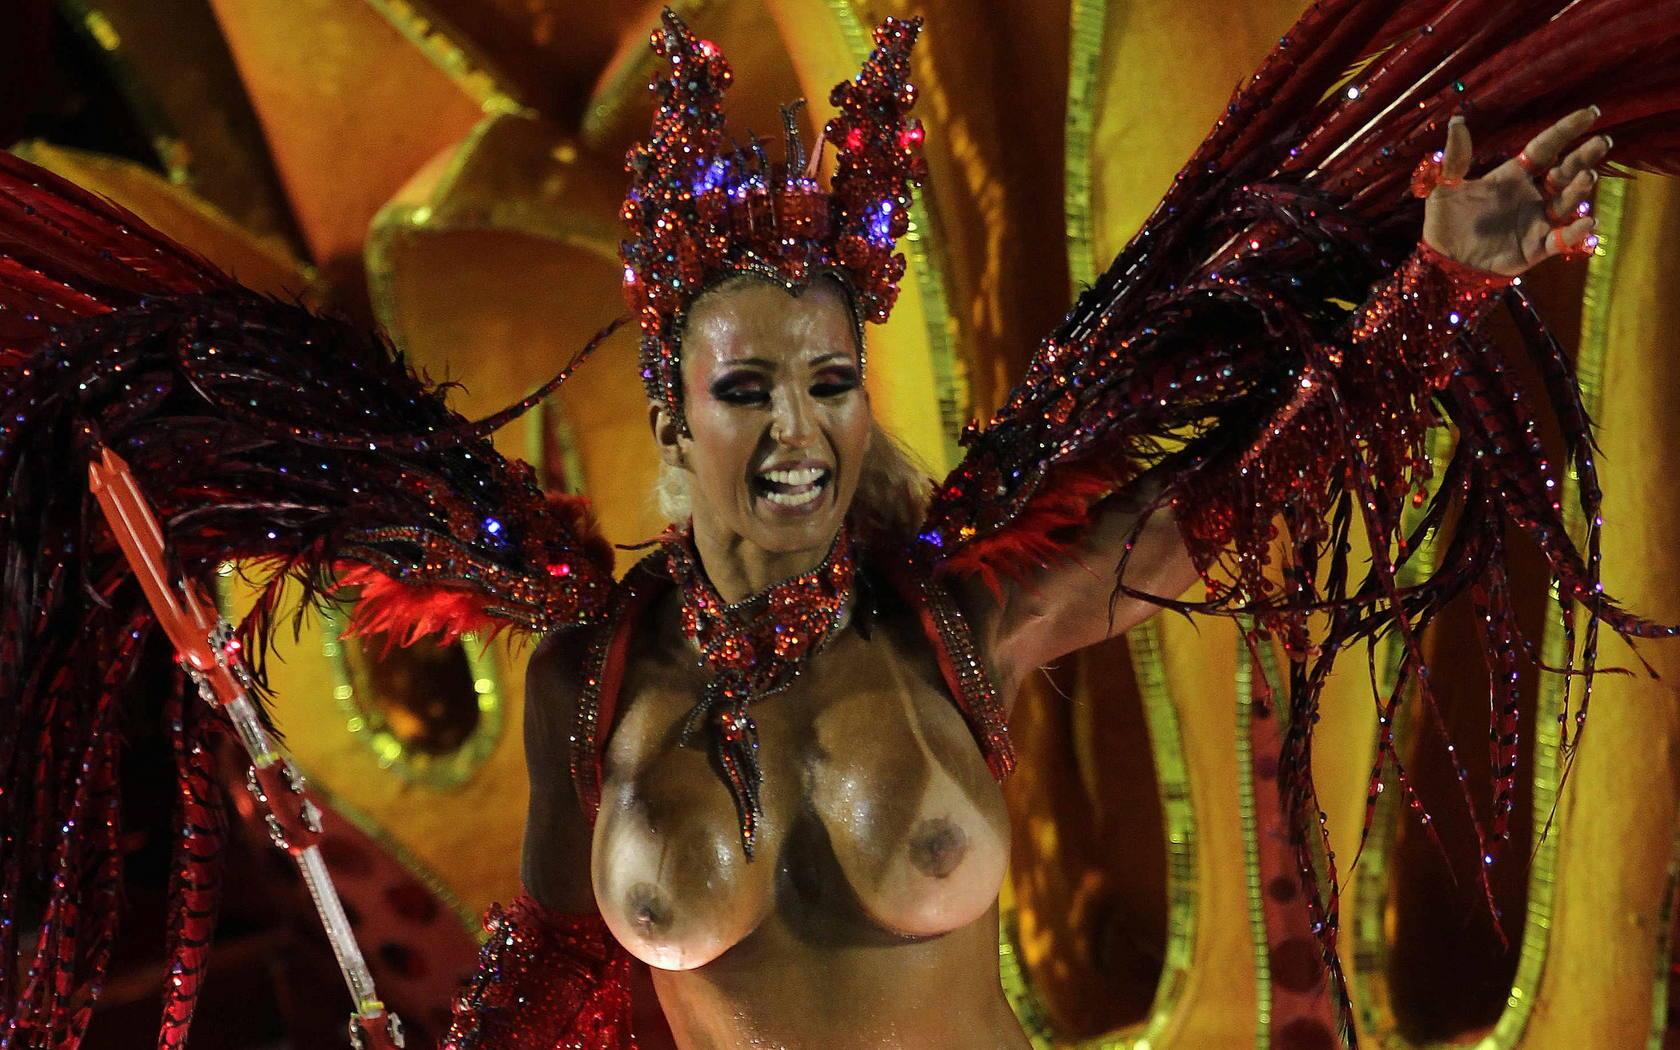 nepristoyniy-karnaval-porno